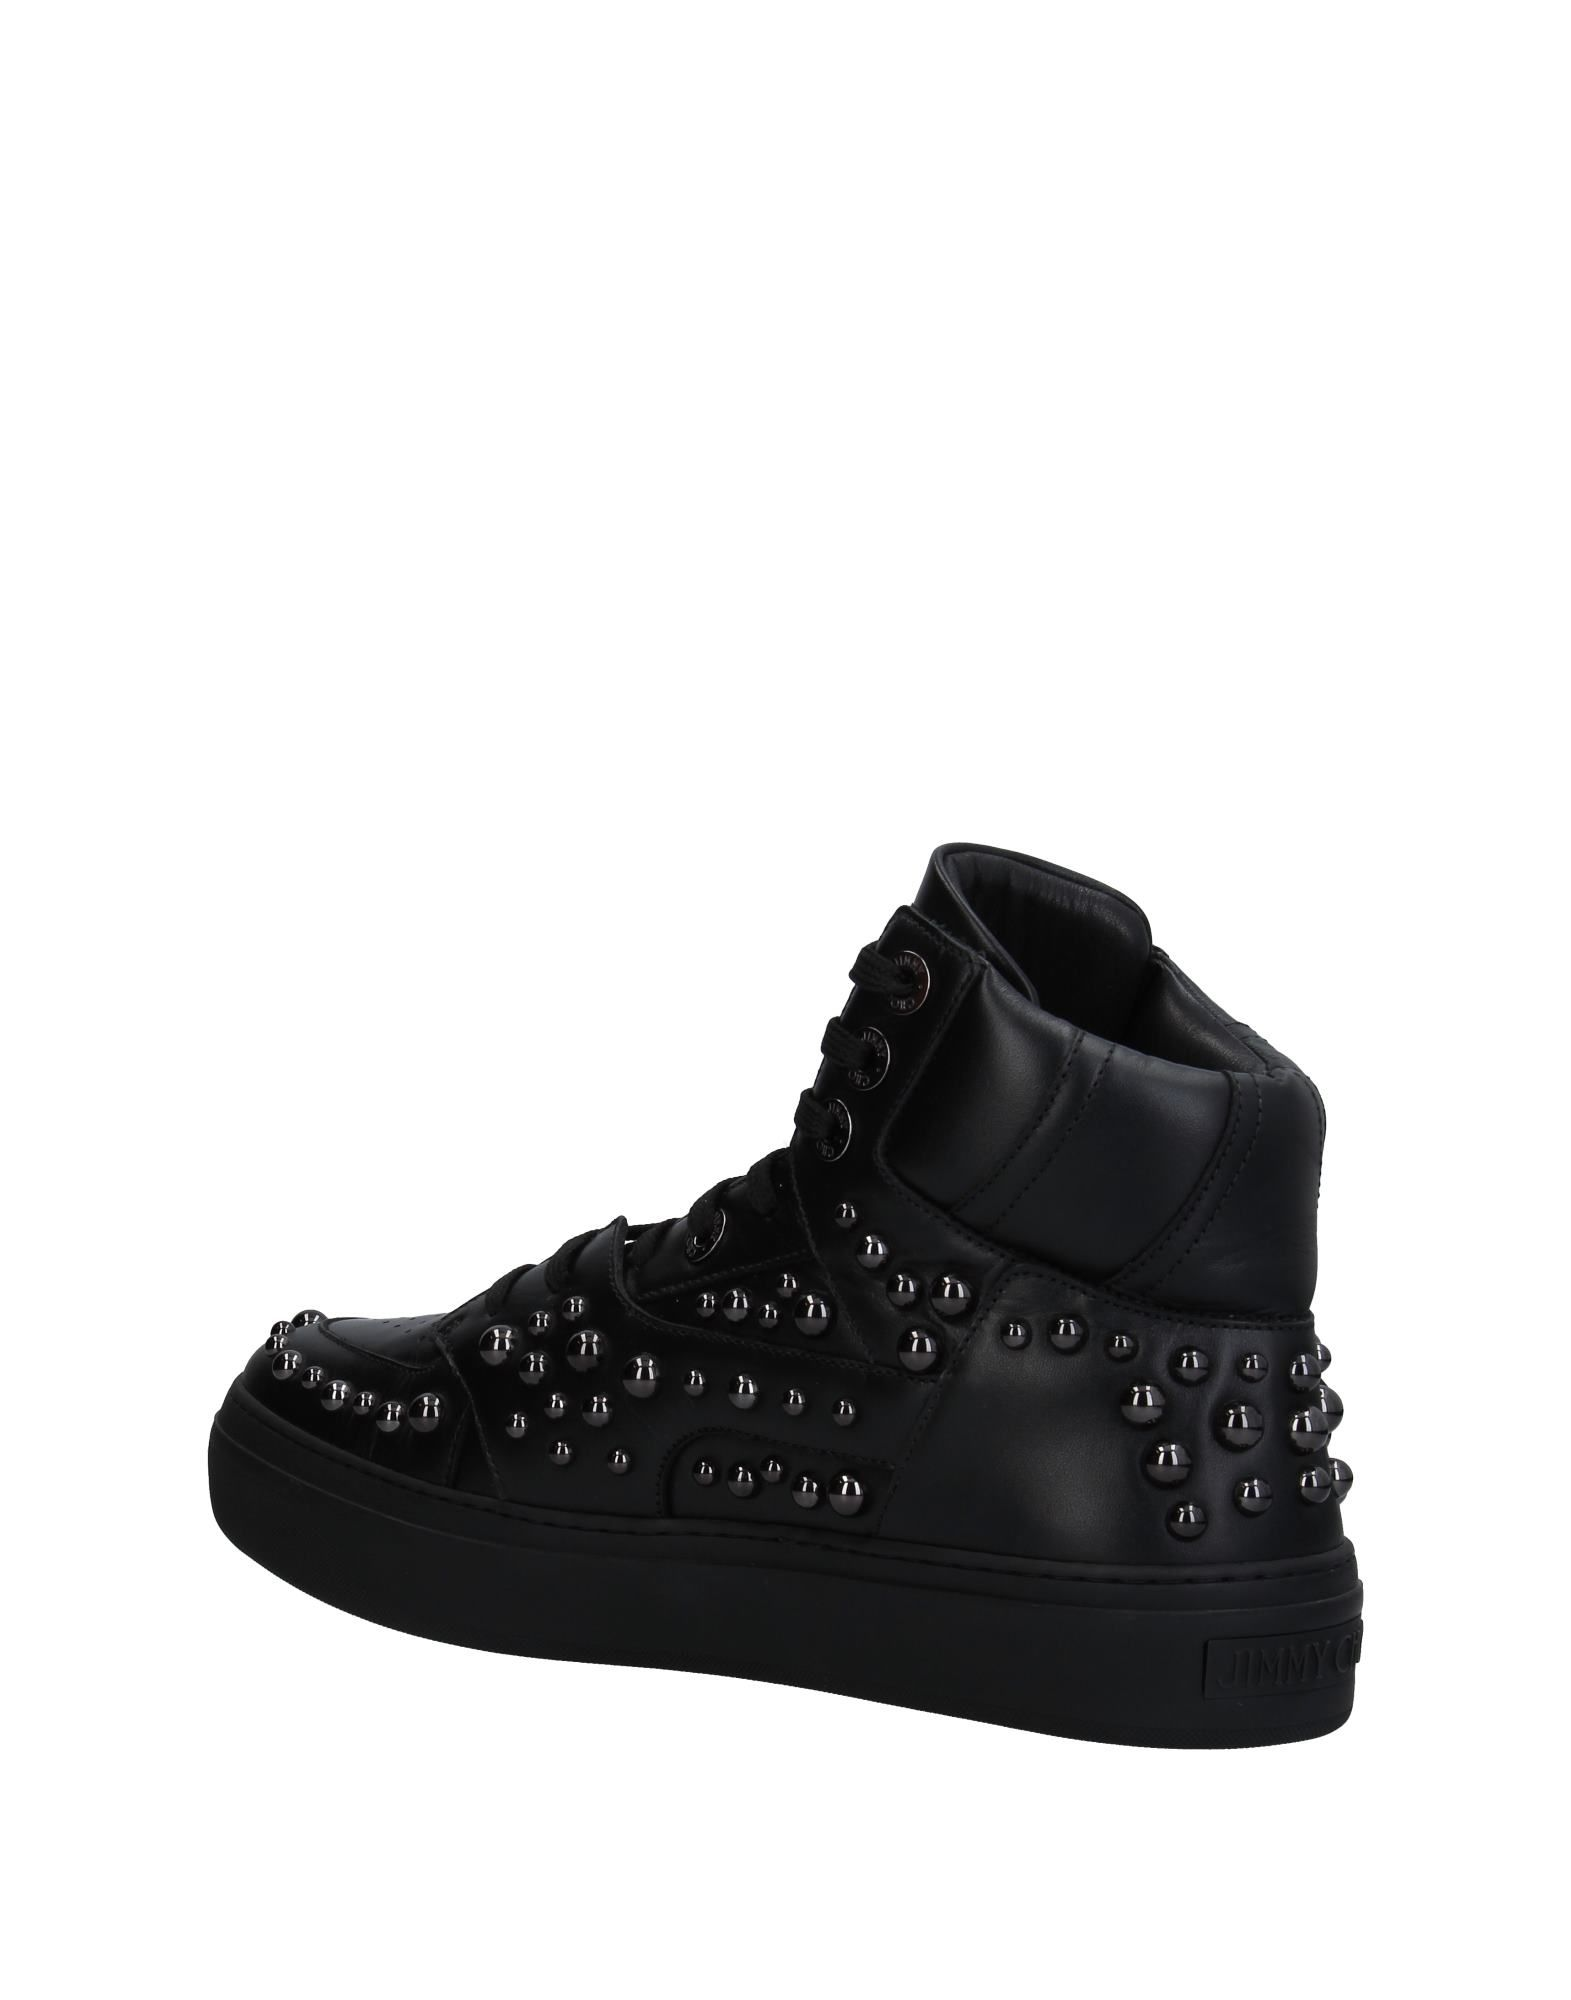 Jimmy Choo Sneakers Herren    11396112PA Neue Schuhe 32a793